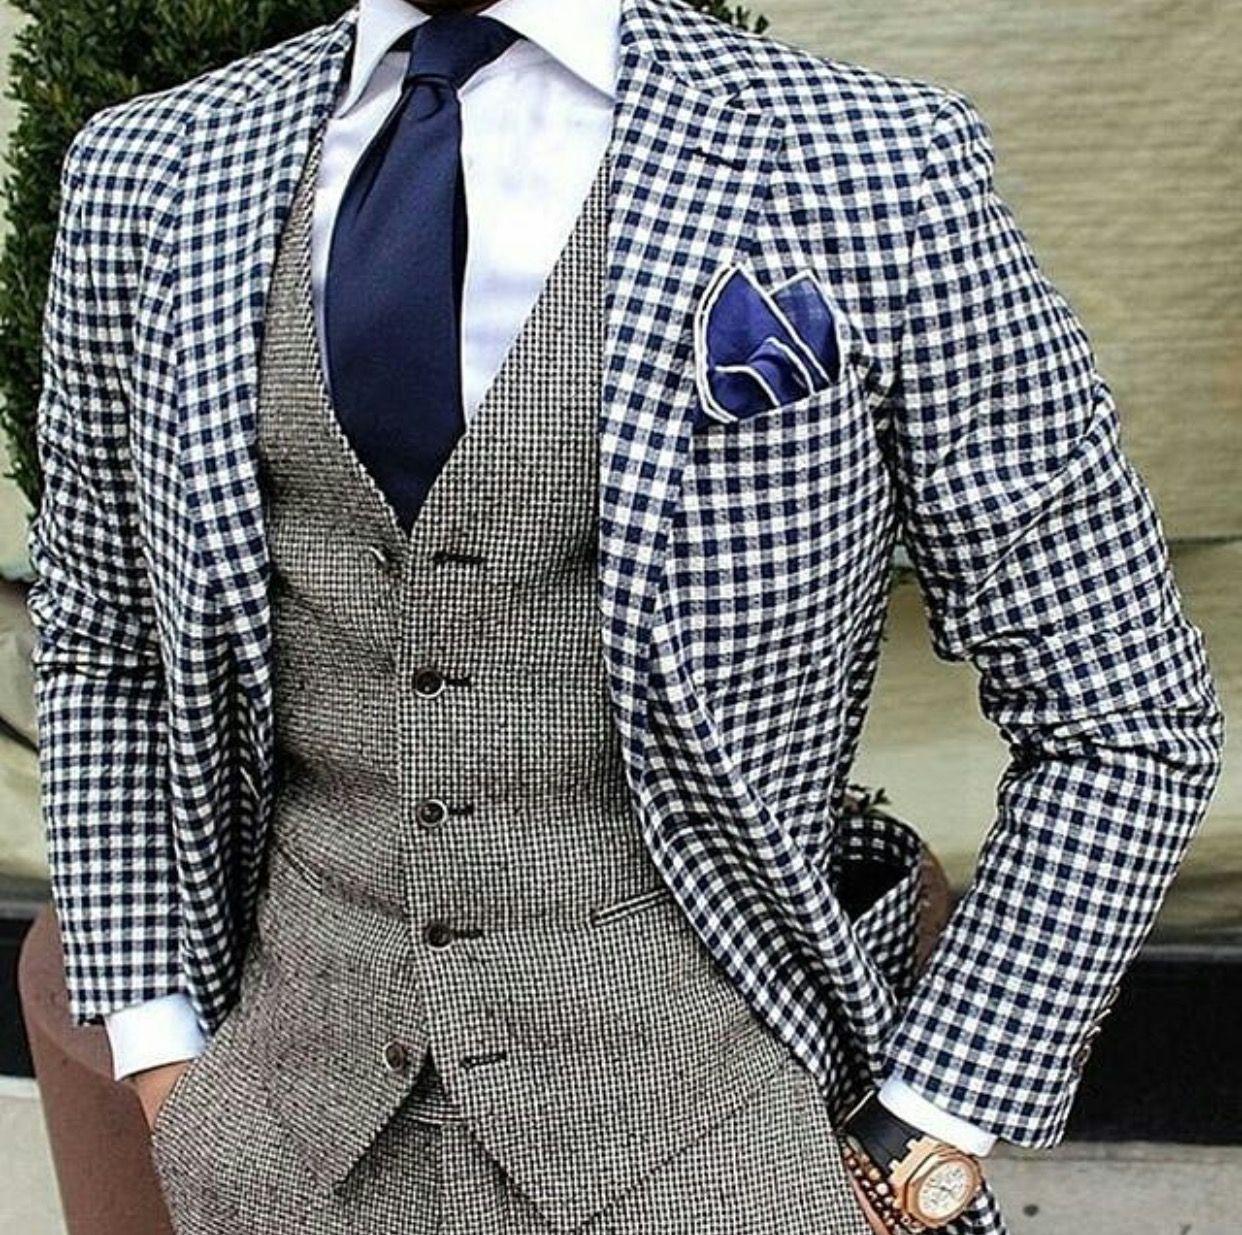 #Elegance #Fashion #Menfashion #Menstyle #Luxury #Dapper #Class #Sartorial #Style #Lookcool #Trendy #Bespoke #Dandy #Classy #Awesome #Amazing #Tailoring #Stylishmen #Gentlemanstyle #Gent #Outfit #TimelessElegance #Charming #Apparel #Clothing #Elegant #Instafashion